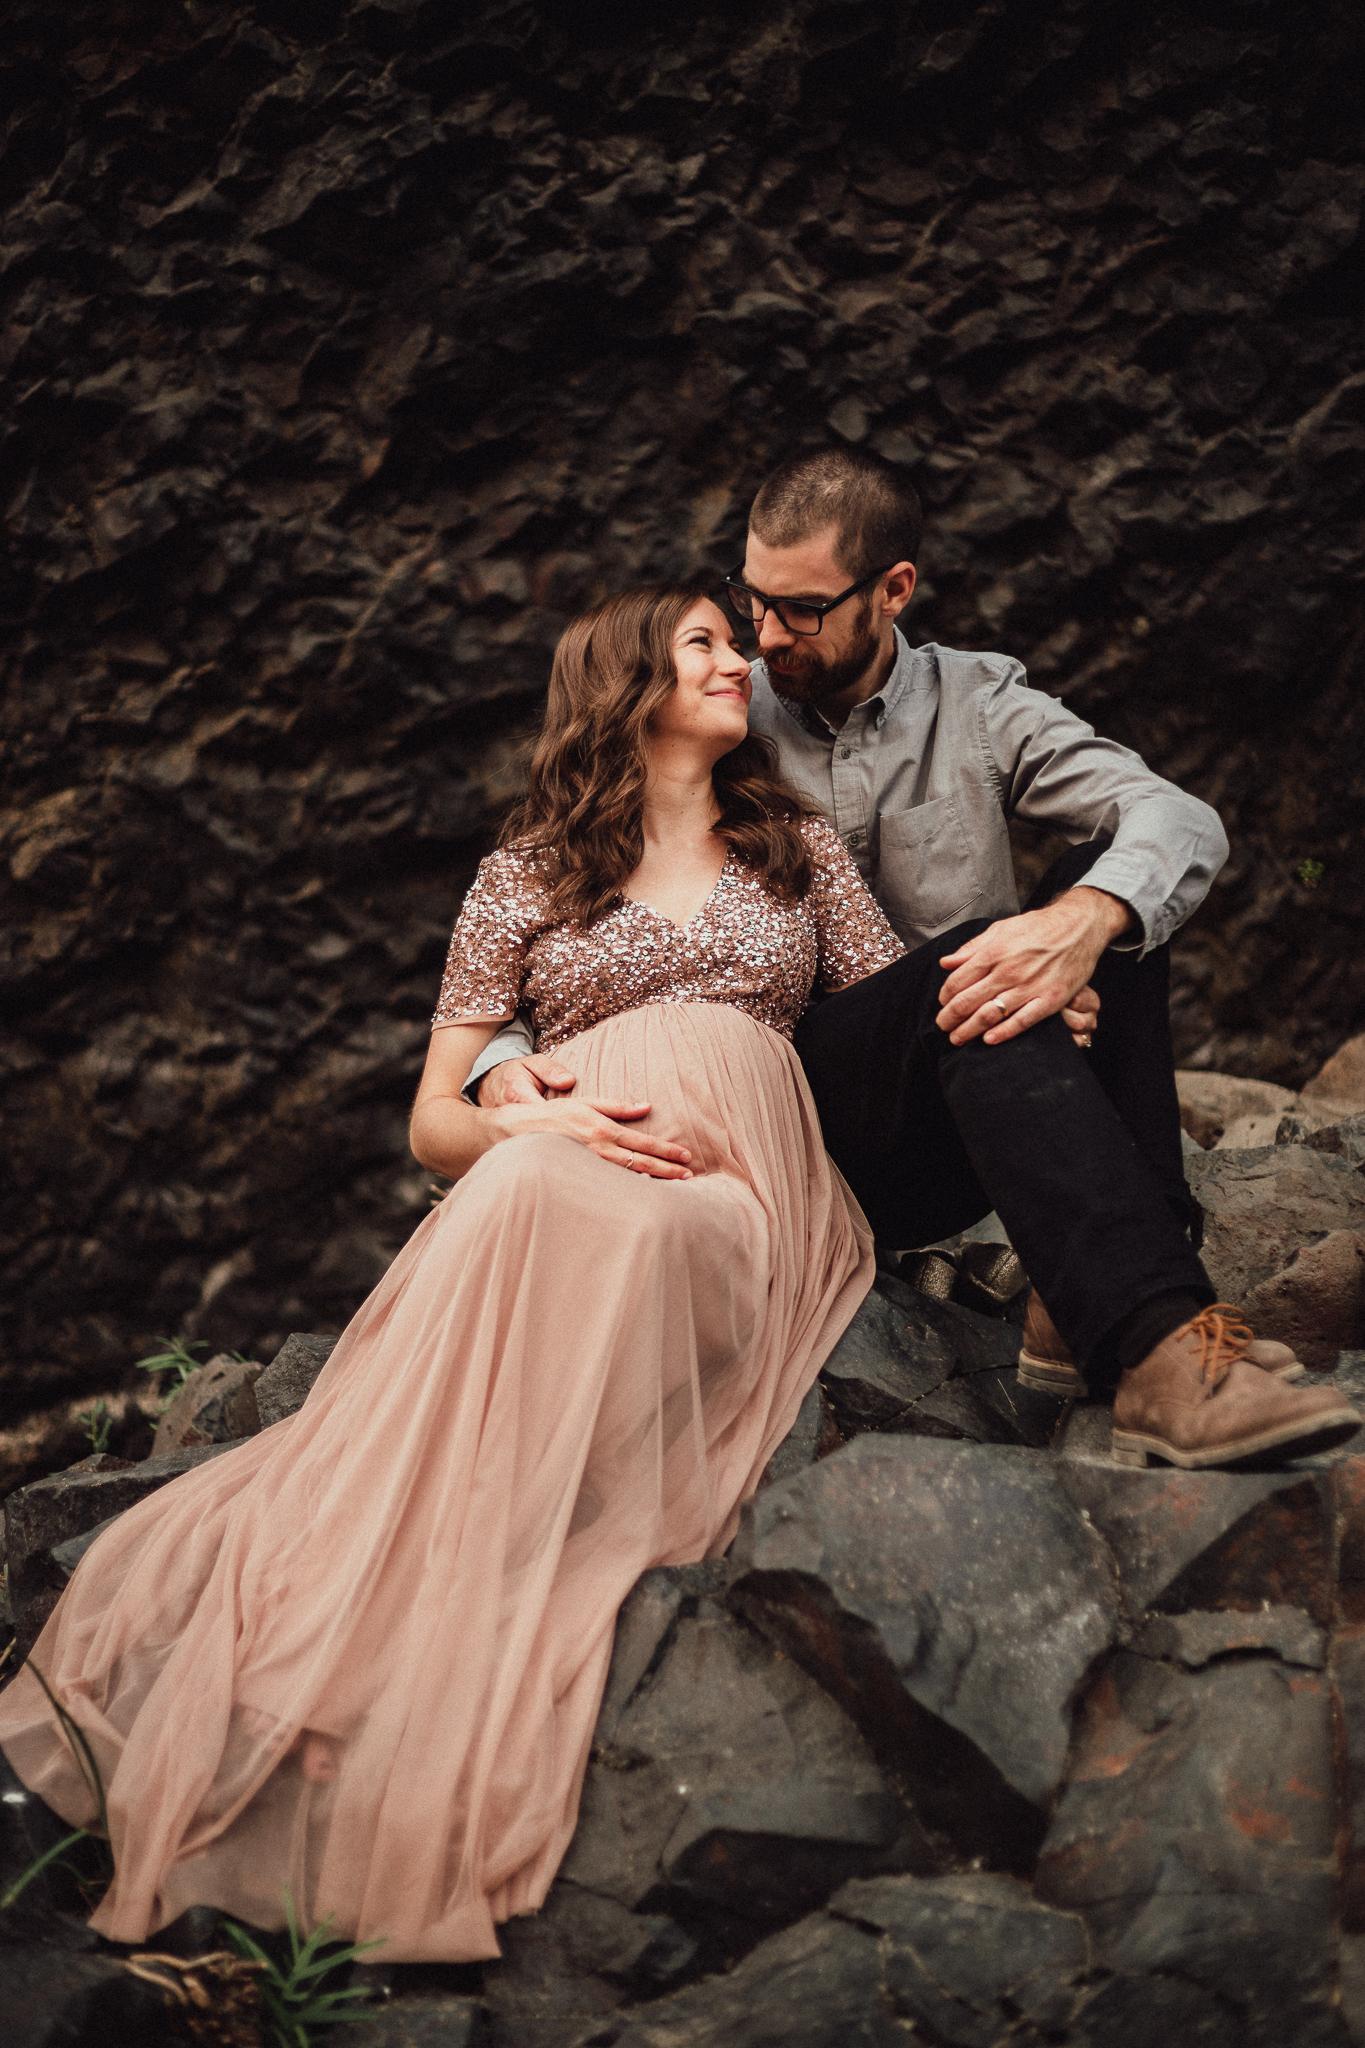 Spokane couples photography